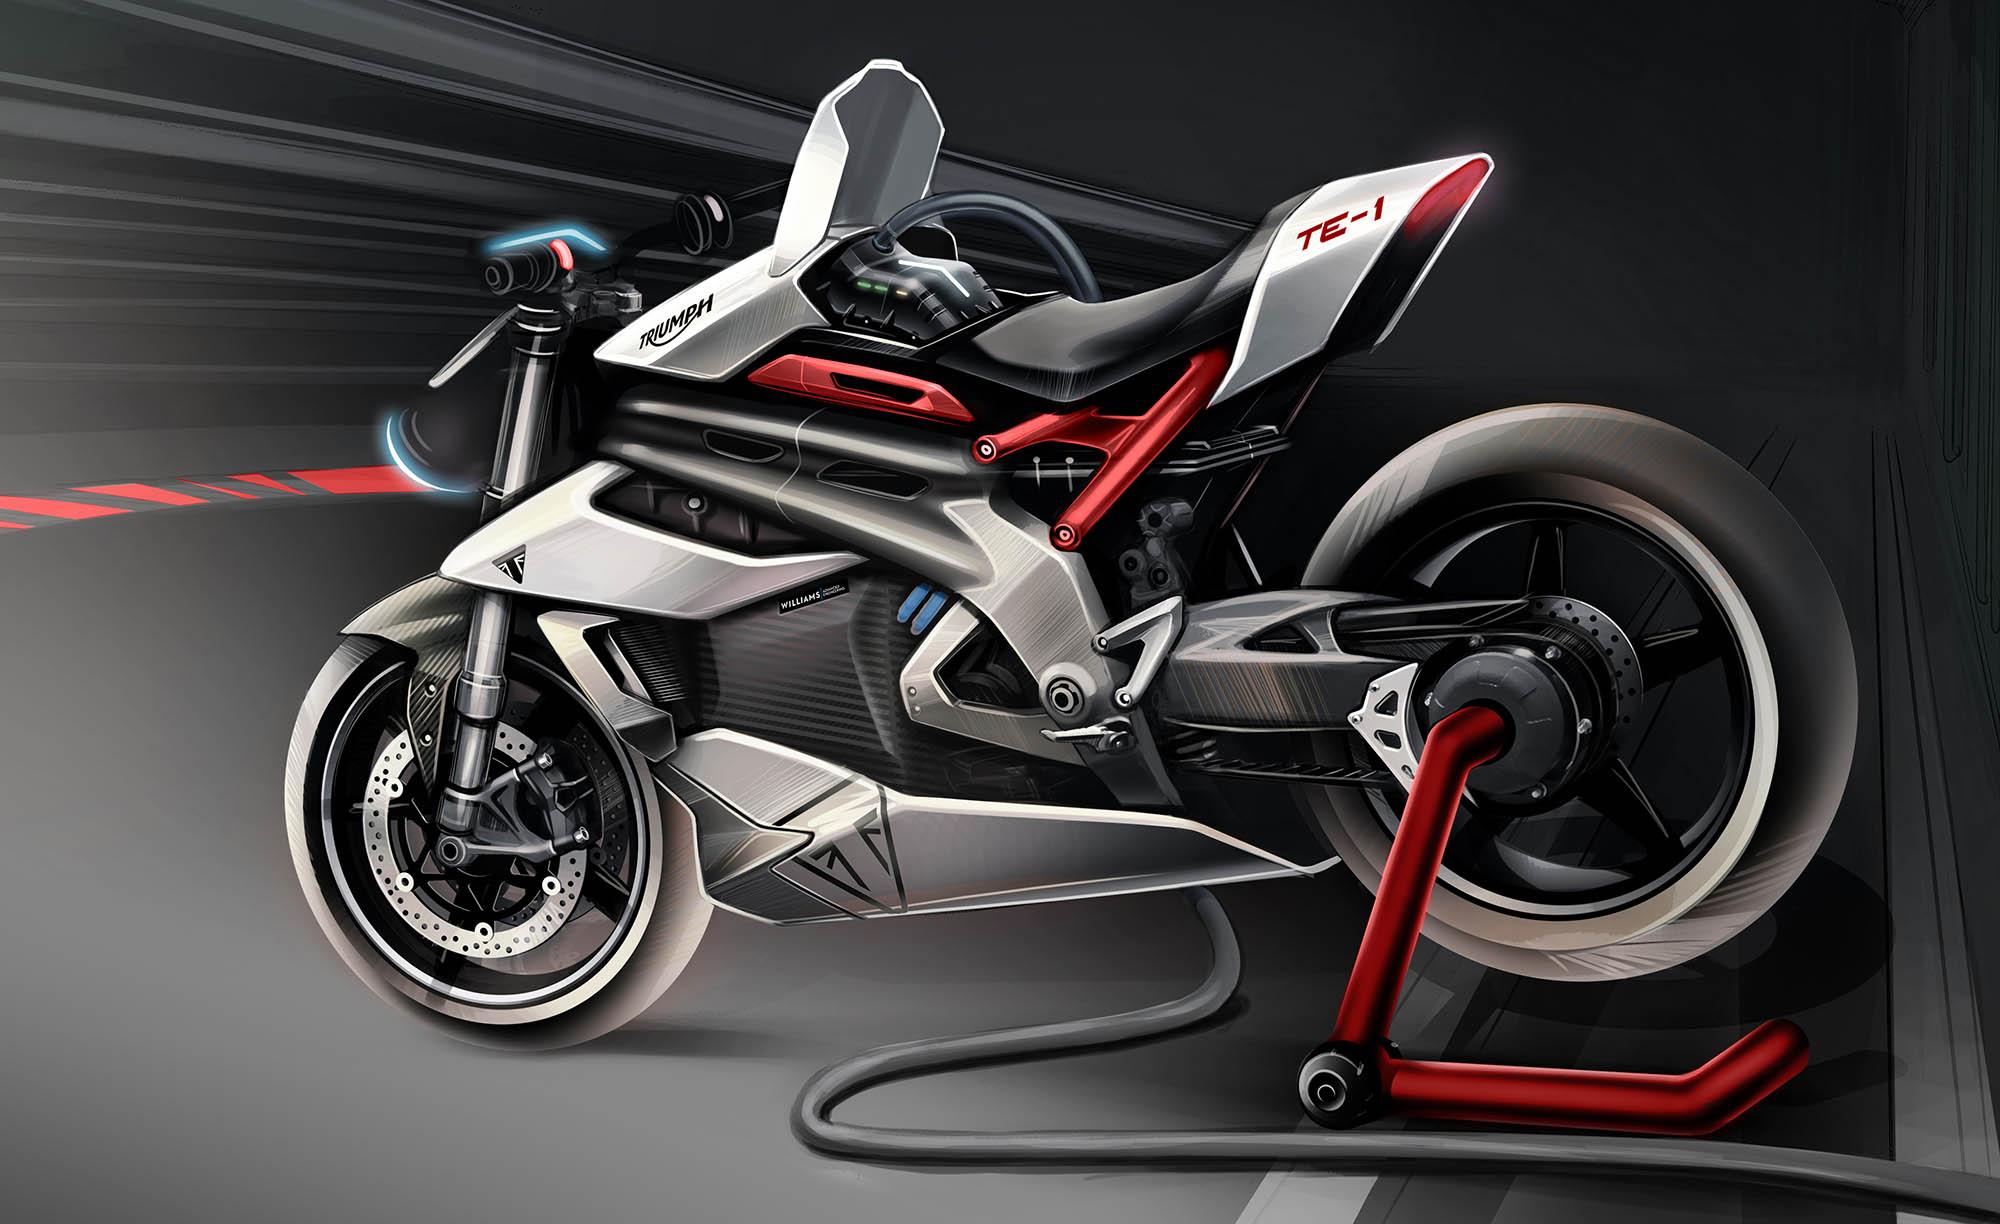 Project-Triumph-TE-1-Prototype-Motorcycle-Design-05